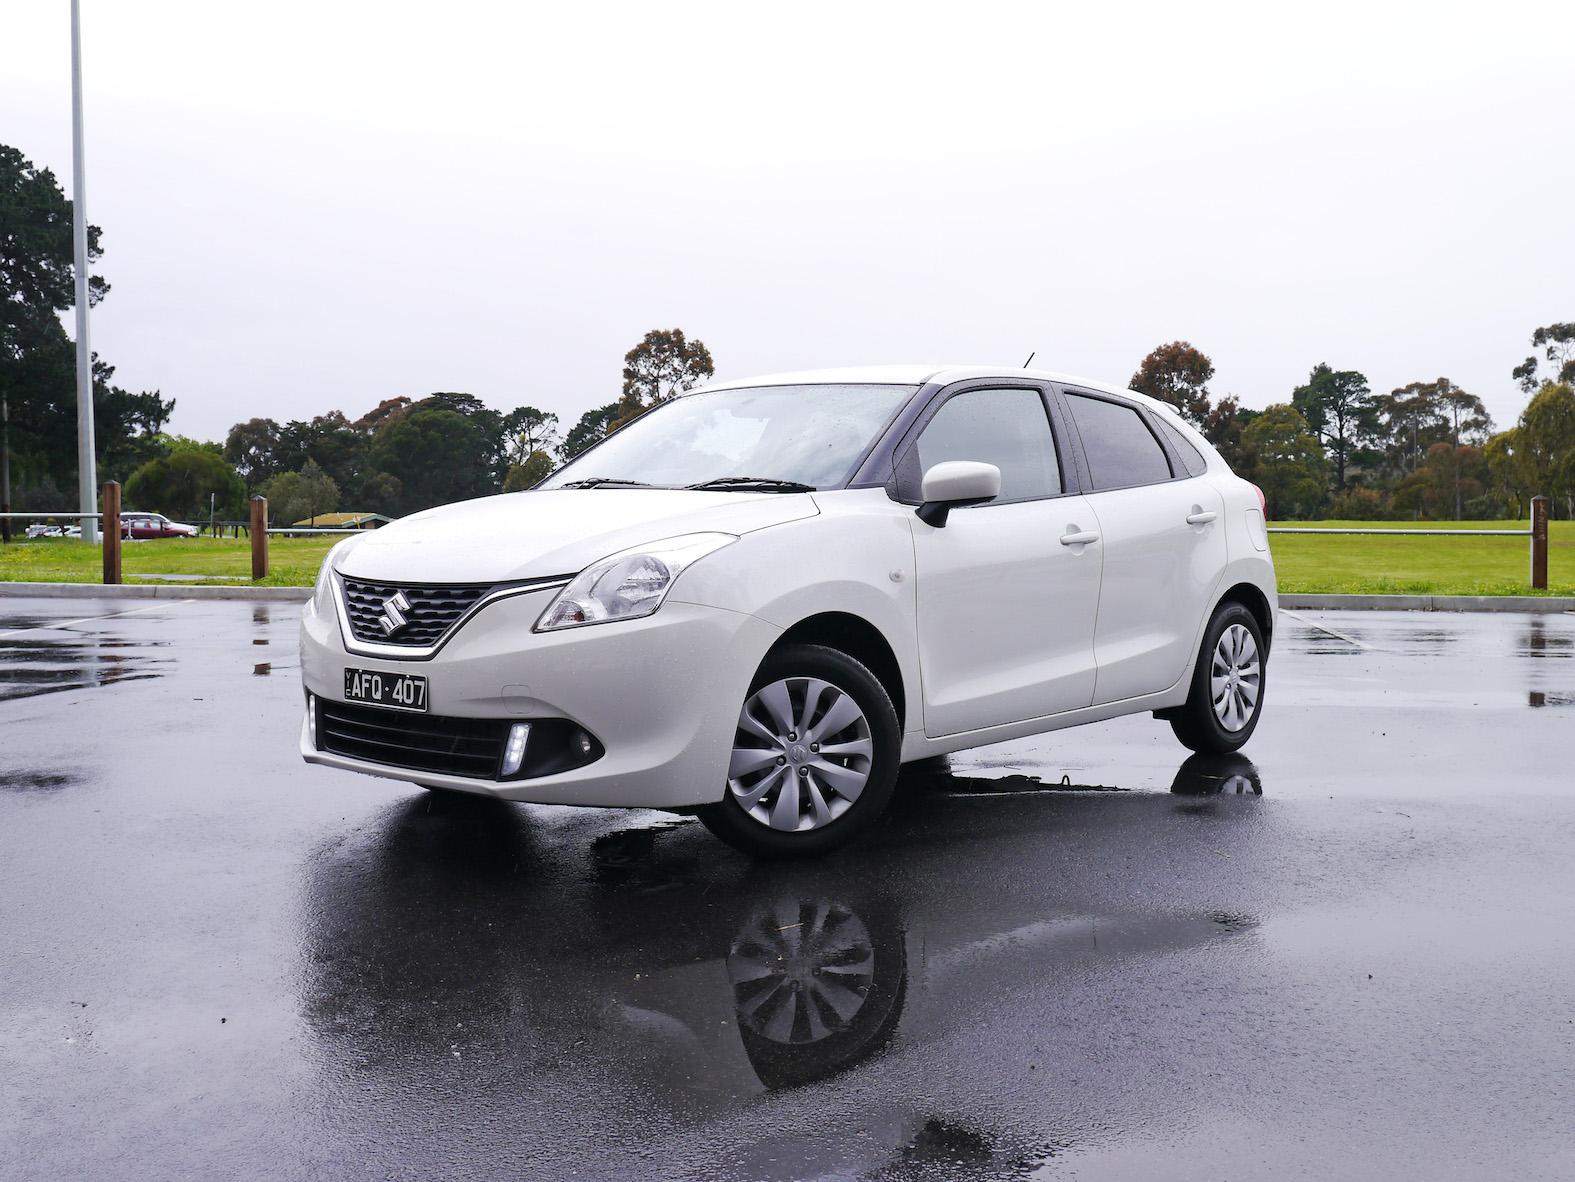 2016 Suzuki Baleno GL Auto REVIEW, Price, Features | Suzuki Pumps Up The Small Car Value